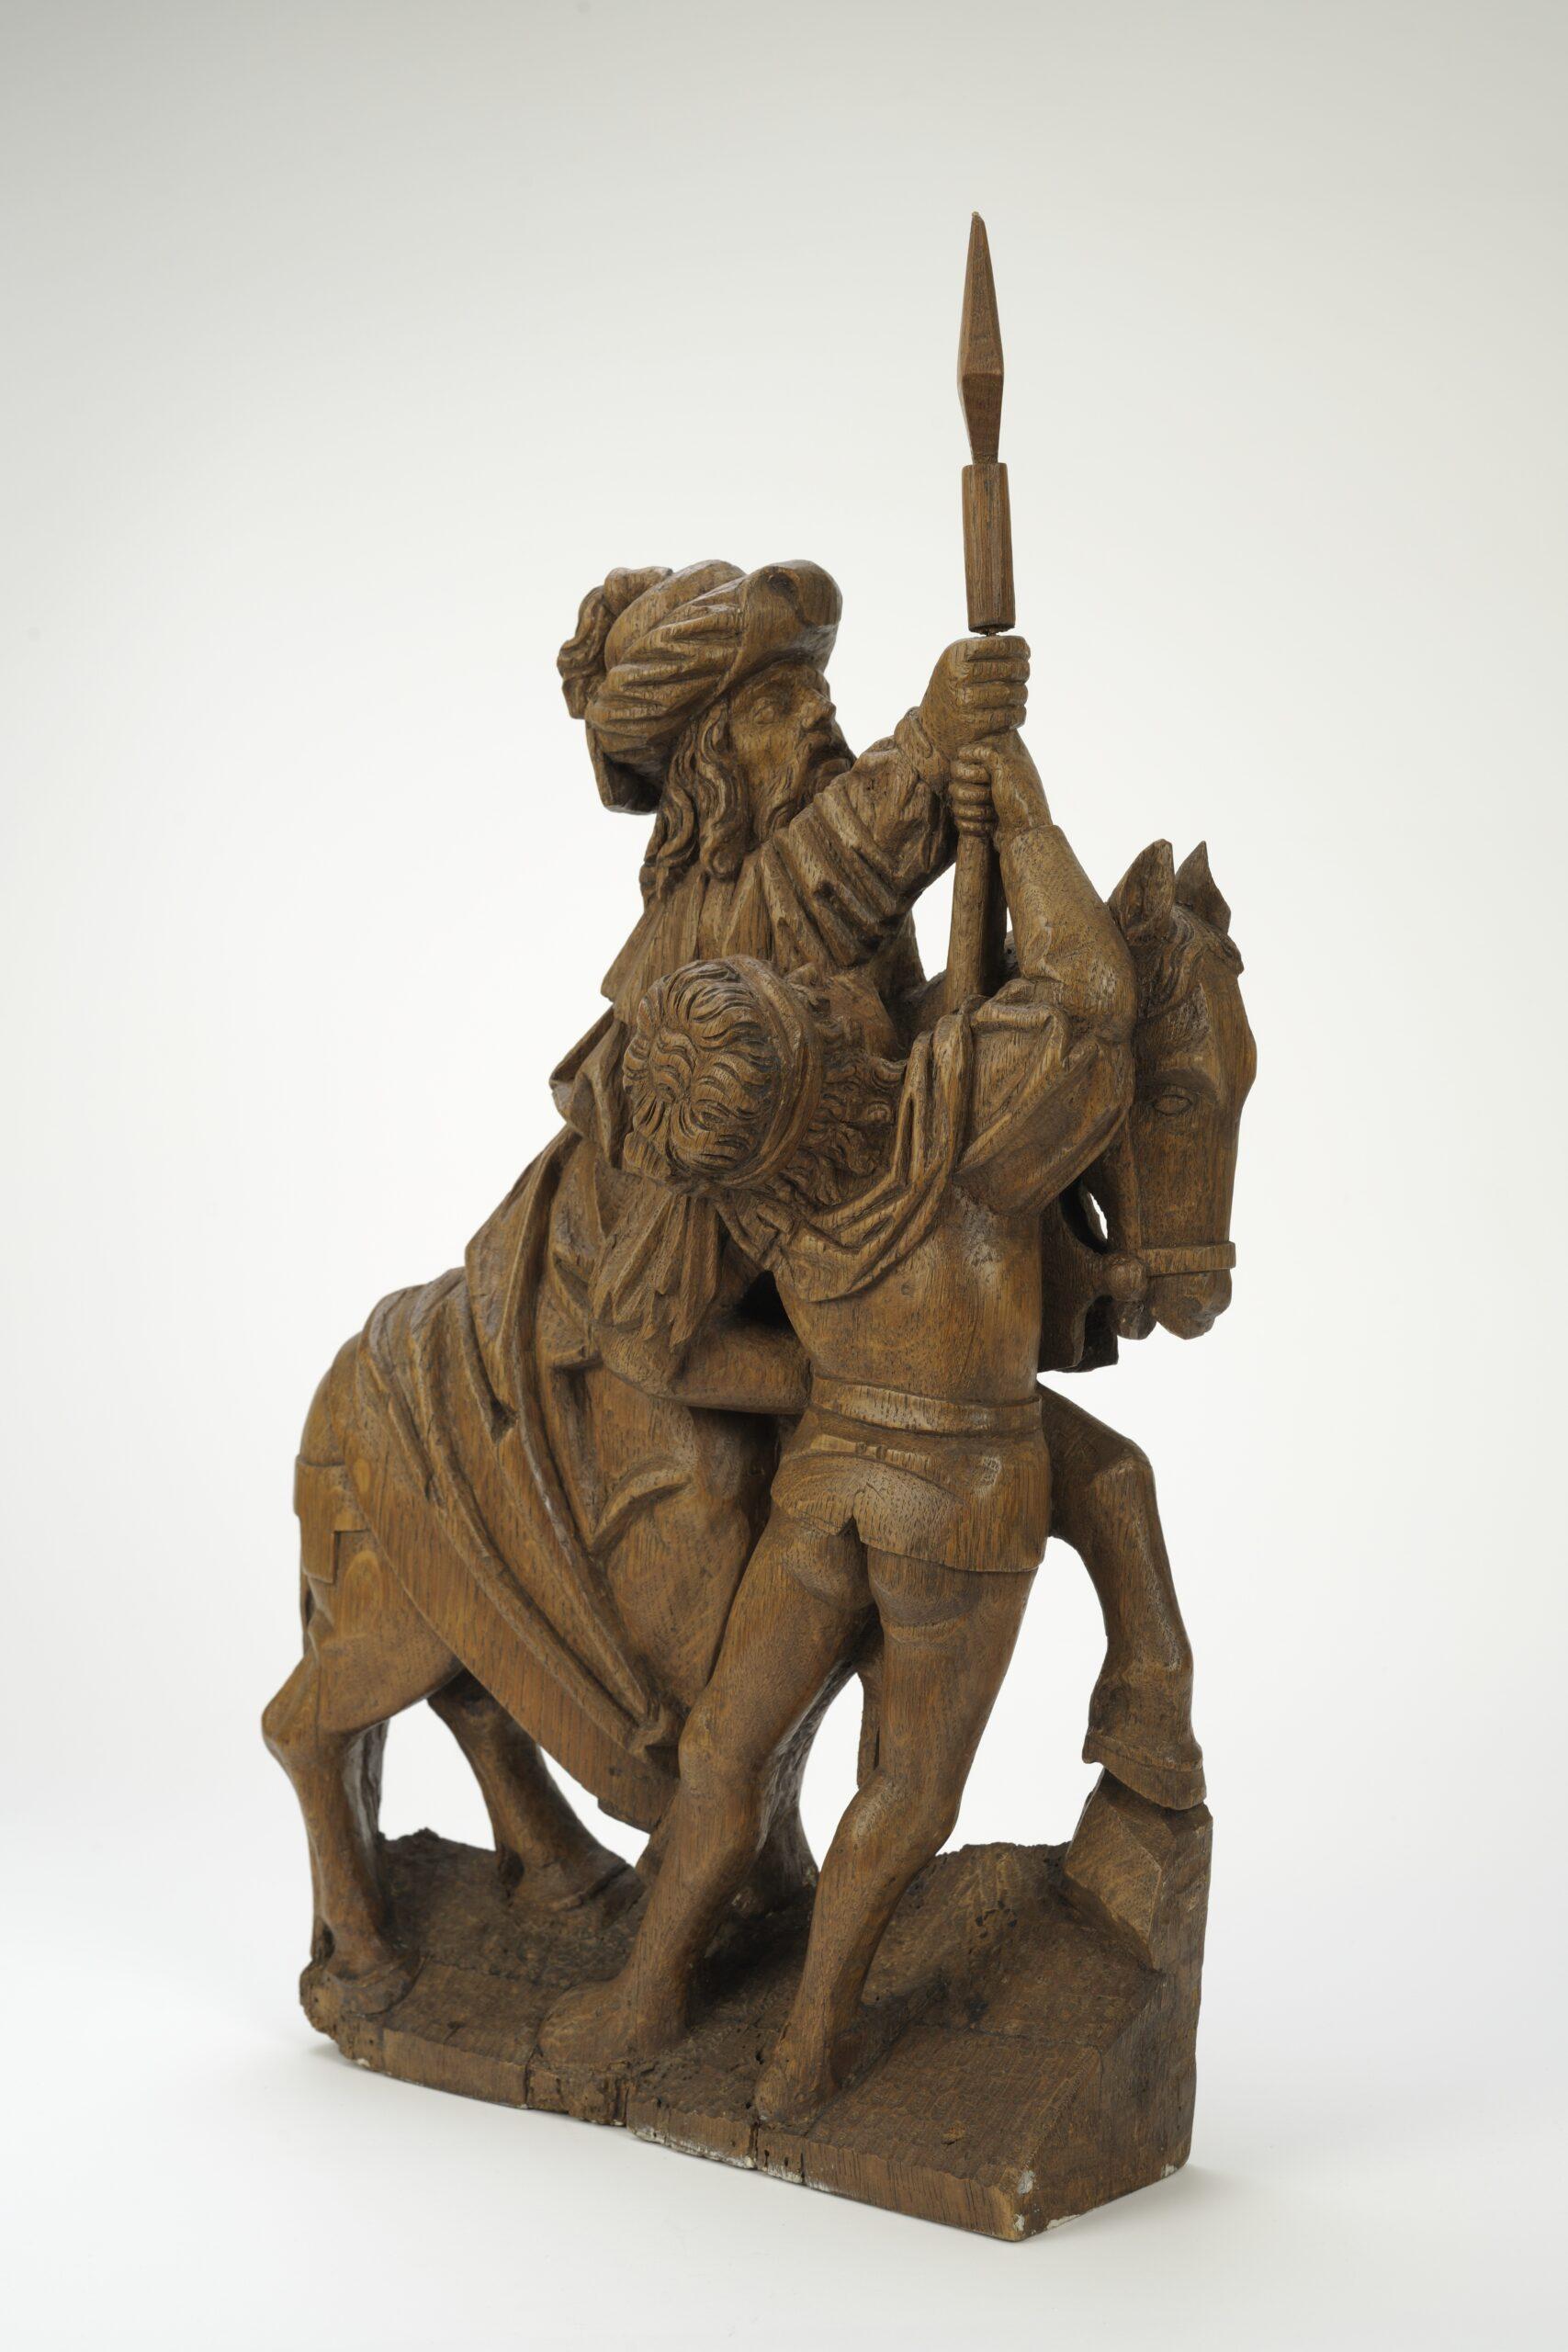 Southern Netherlandish workshop, Two Horsemen and Longinus, early 16th centuryArt Museum of Estonia